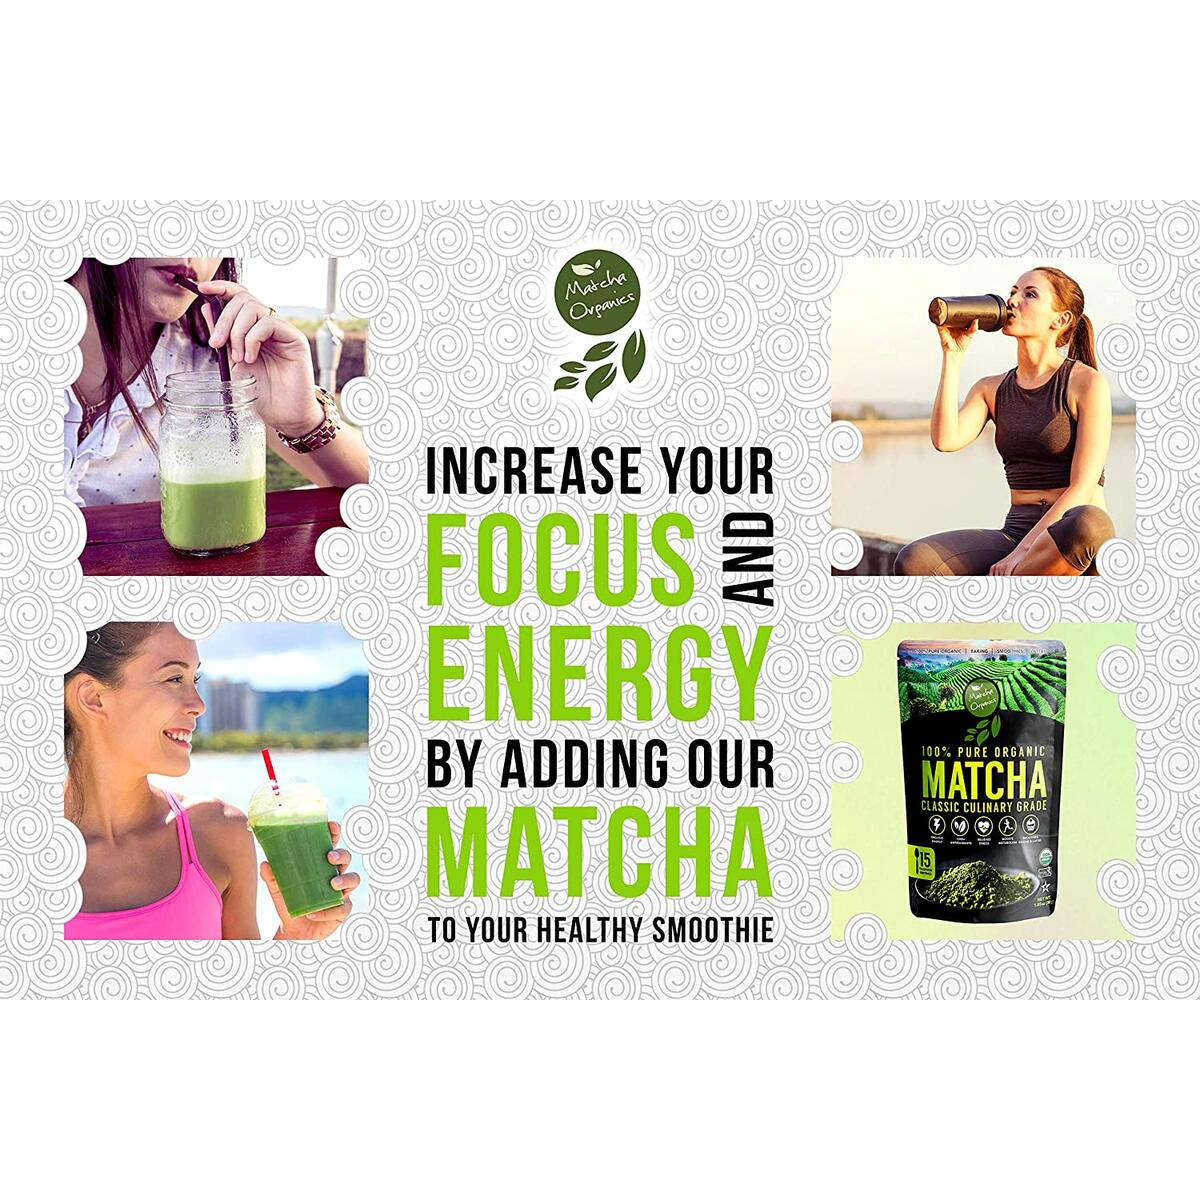 Classic Culinary Matcha Green Tea Powder - 100% Pure Vegan Matcha with 1500+ Antioxidants - USDA Organic Green Superfood Powder for Baking, Smoothies, & Matcha Tea Lattes by Matcha Organics, 1.05oz